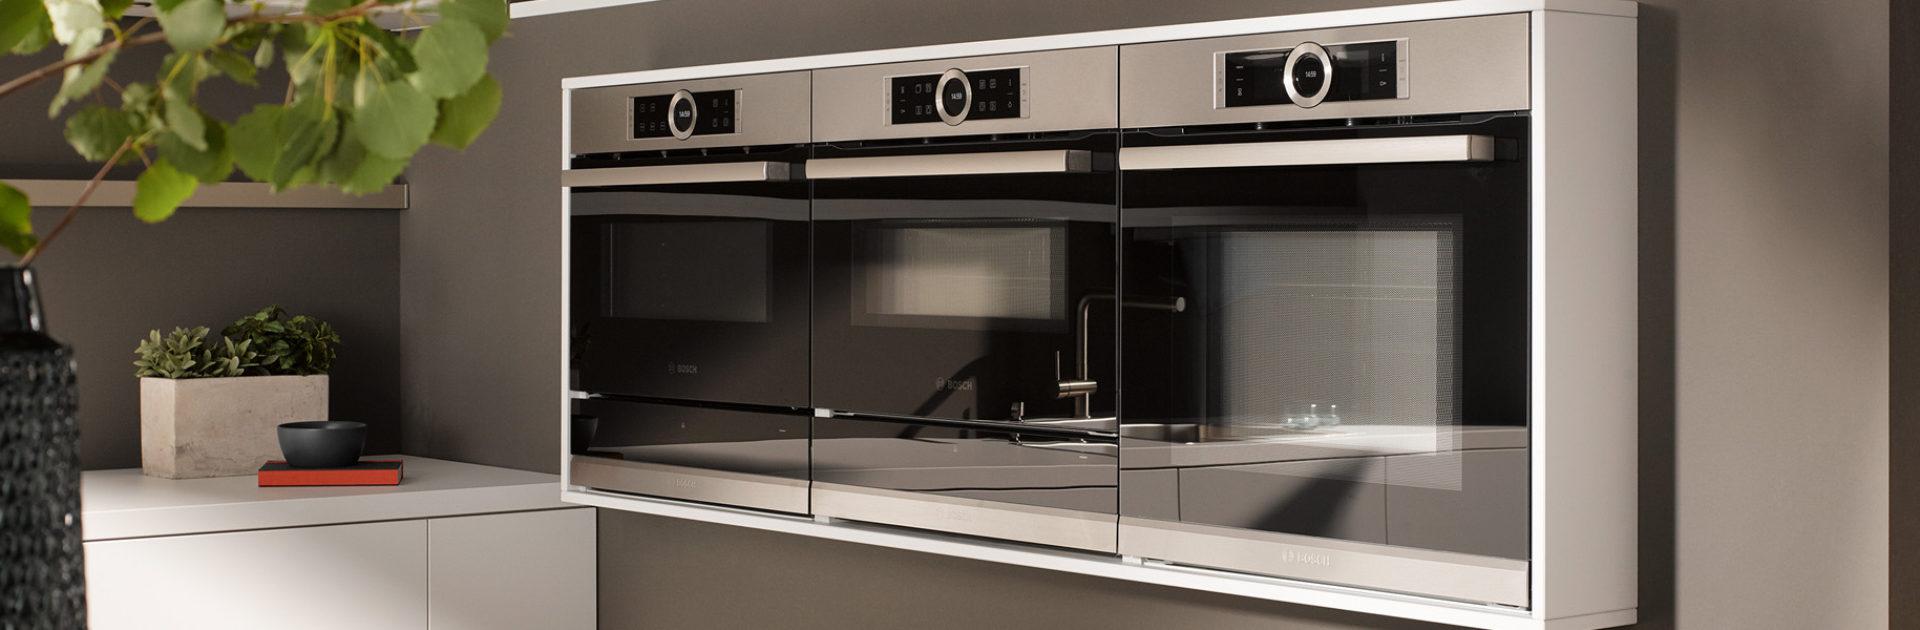 Zwevende ovens   Satink Keukens